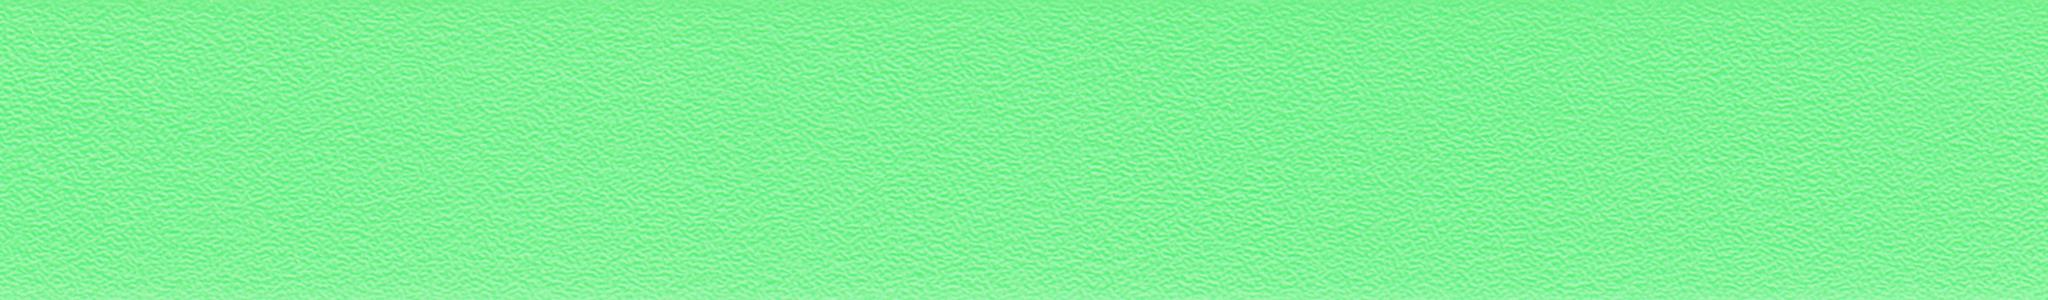 HU 160050 ABS hrana zelená perla 101